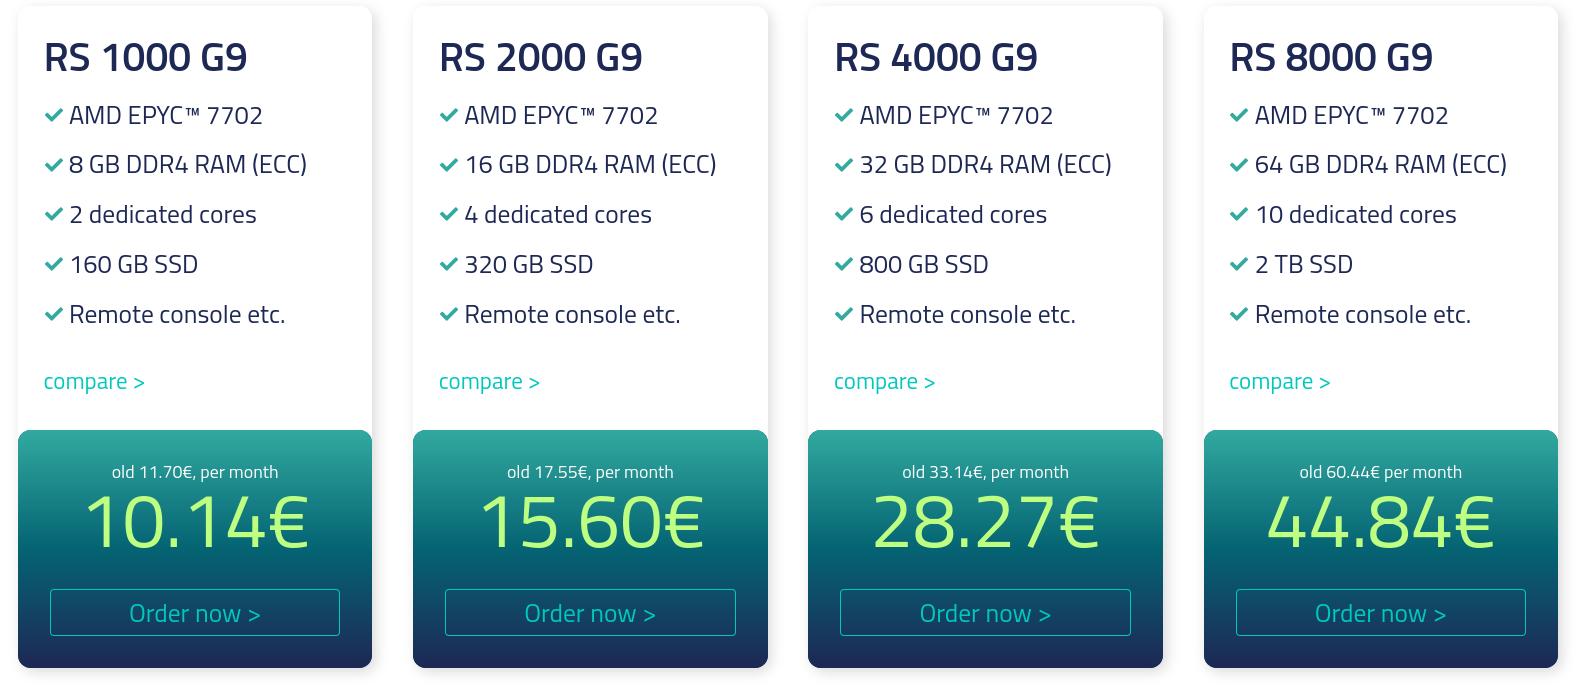 Screenshot 2020 09 06 19 31 18 - netcup who said quality hosting is expensive?